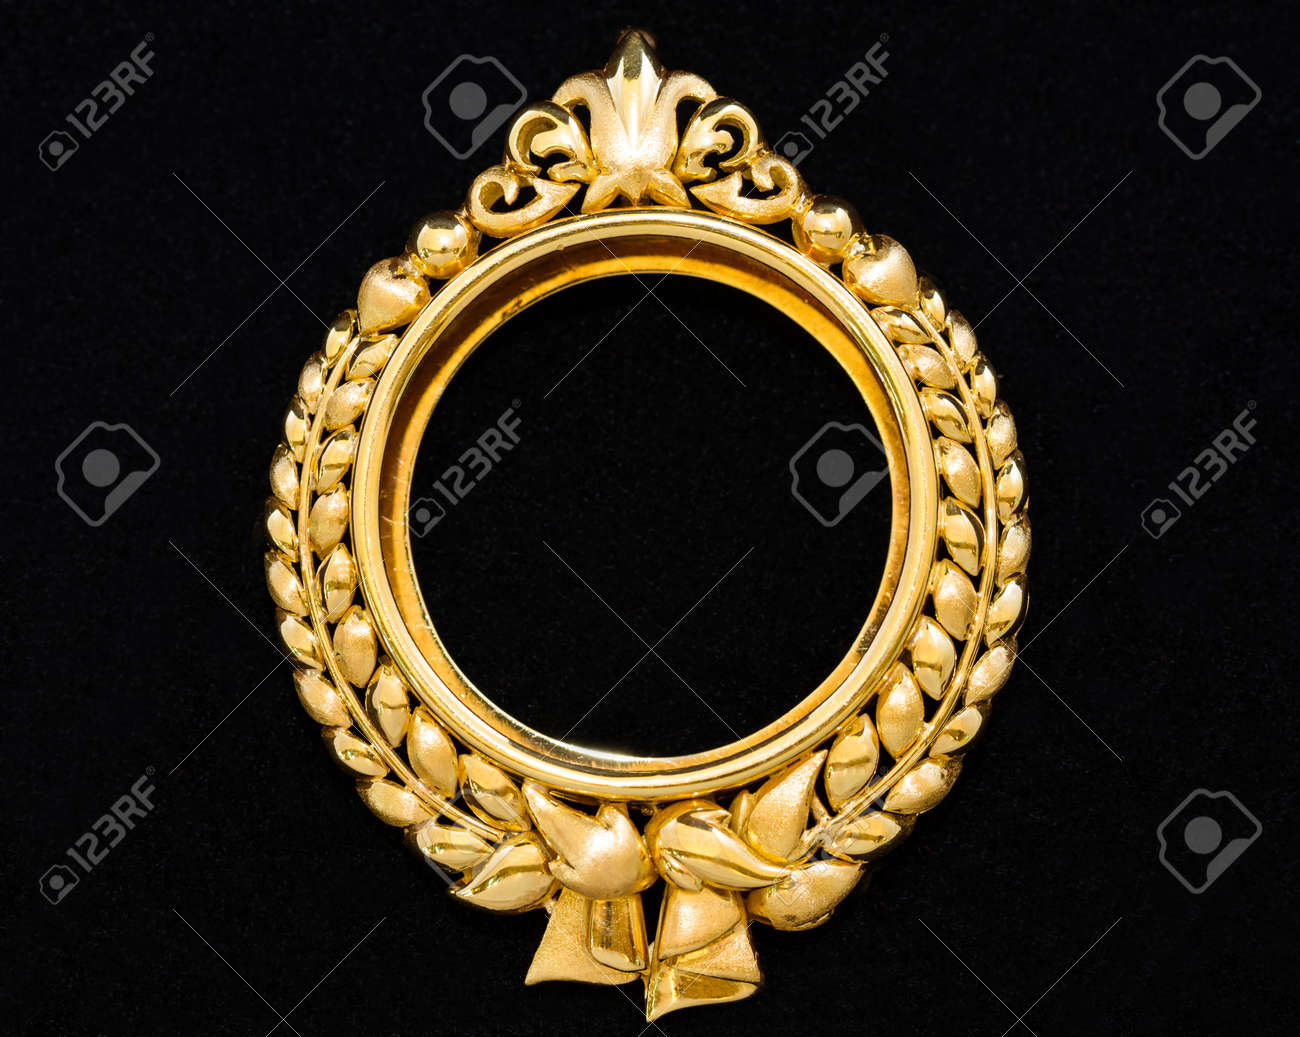 Gold locket frame pendant on black background stock photo picture gold locket frame pendant on black background stock photo 32149693 aloadofball Choice Image